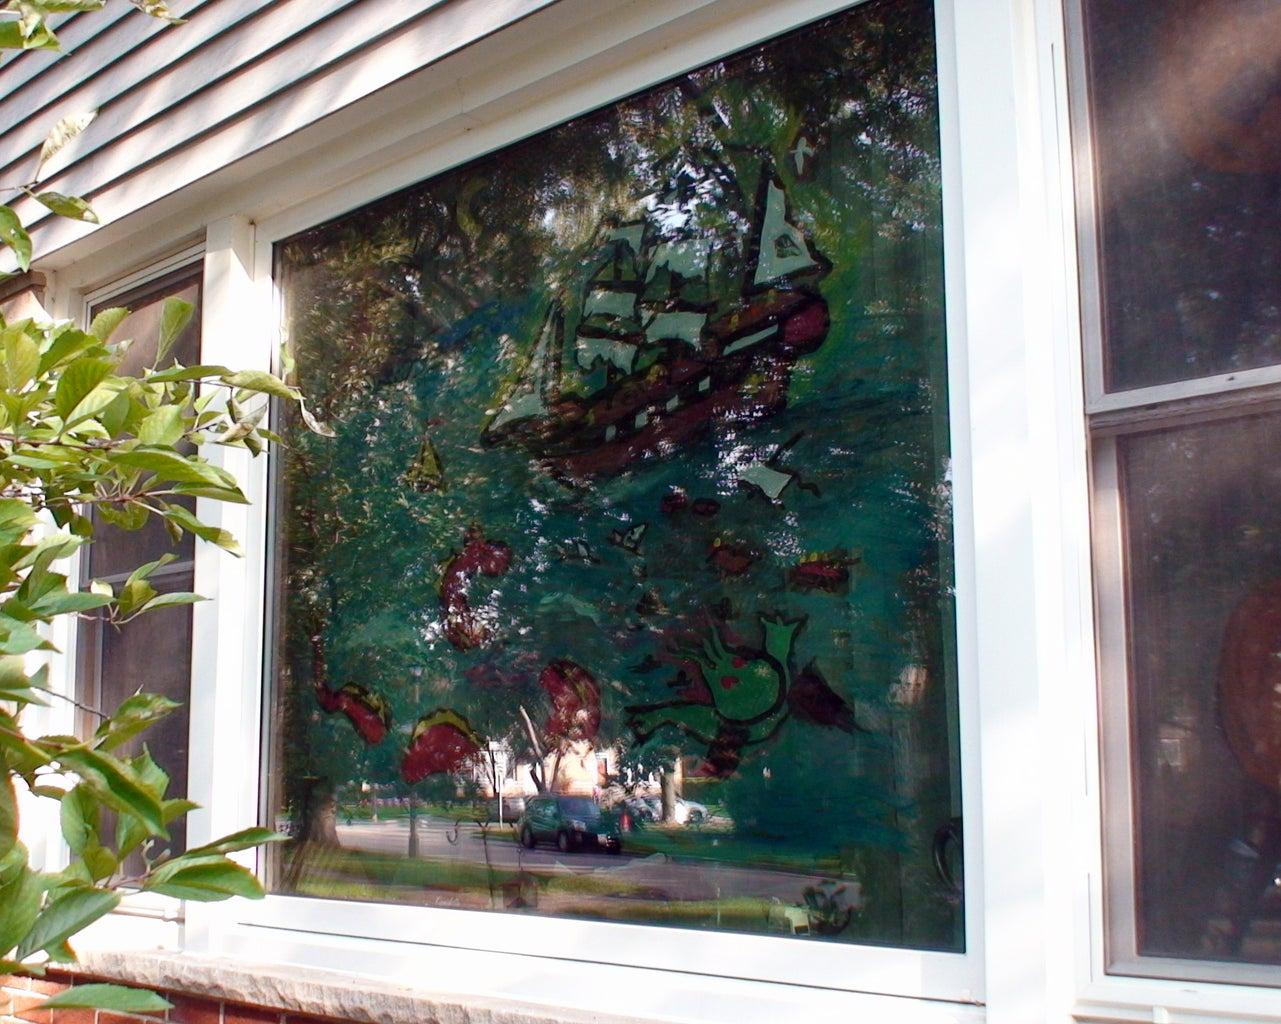 Gallery 2: the East Window